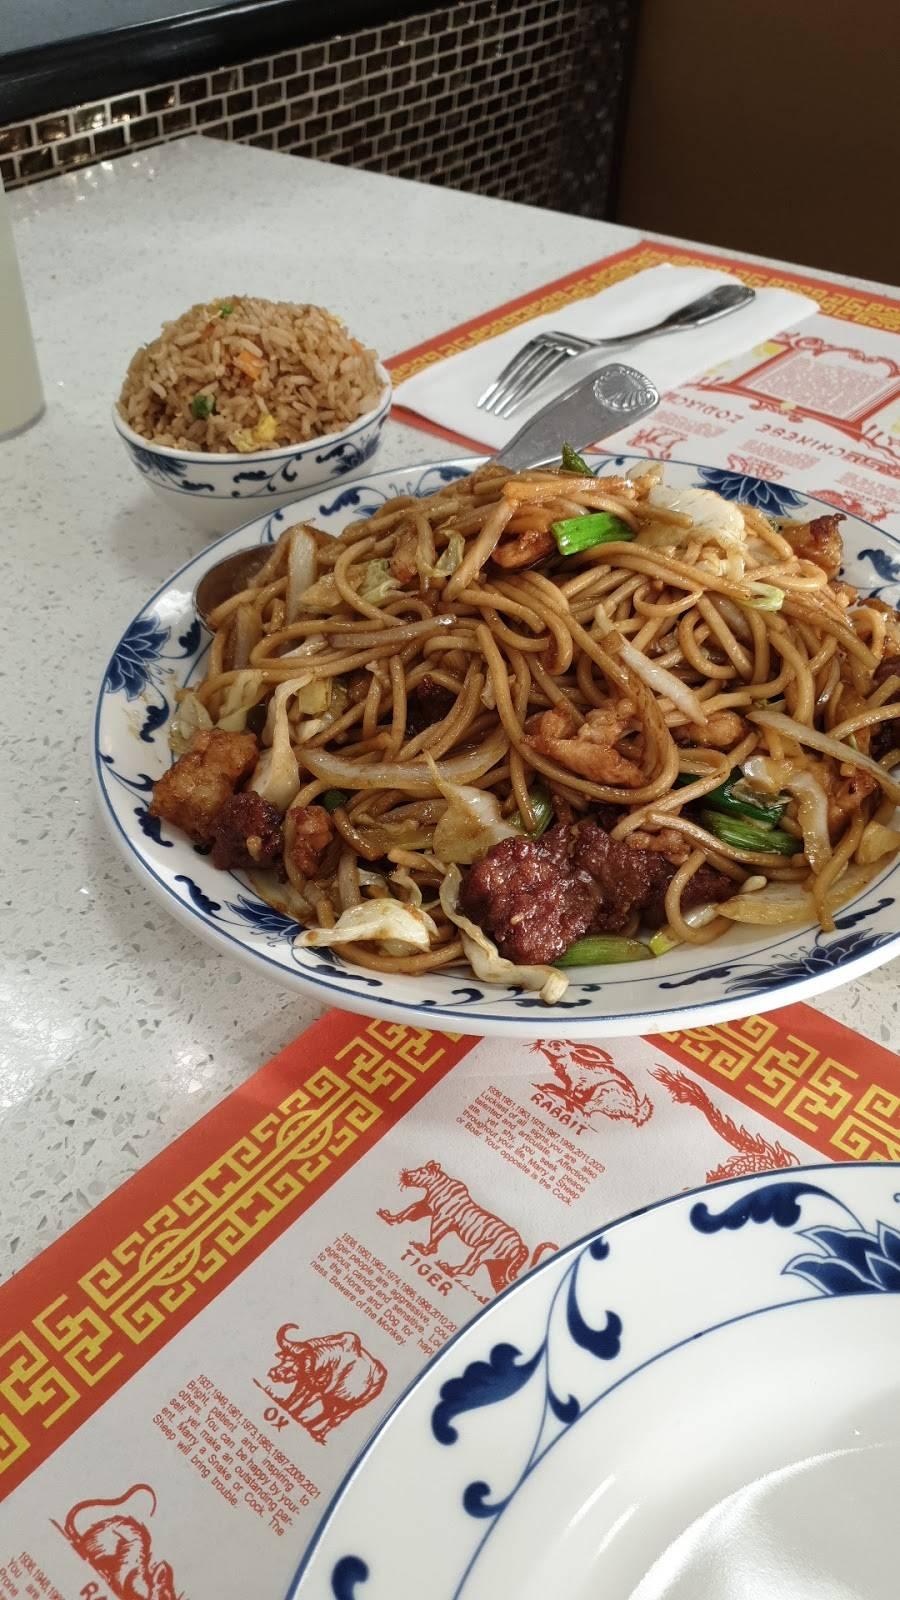 King Food & BBQ | restaurant | 1010 N Hacienda Blvd, La Puente, CA 91744, USA | 6263307765 OR +1 626-330-7765